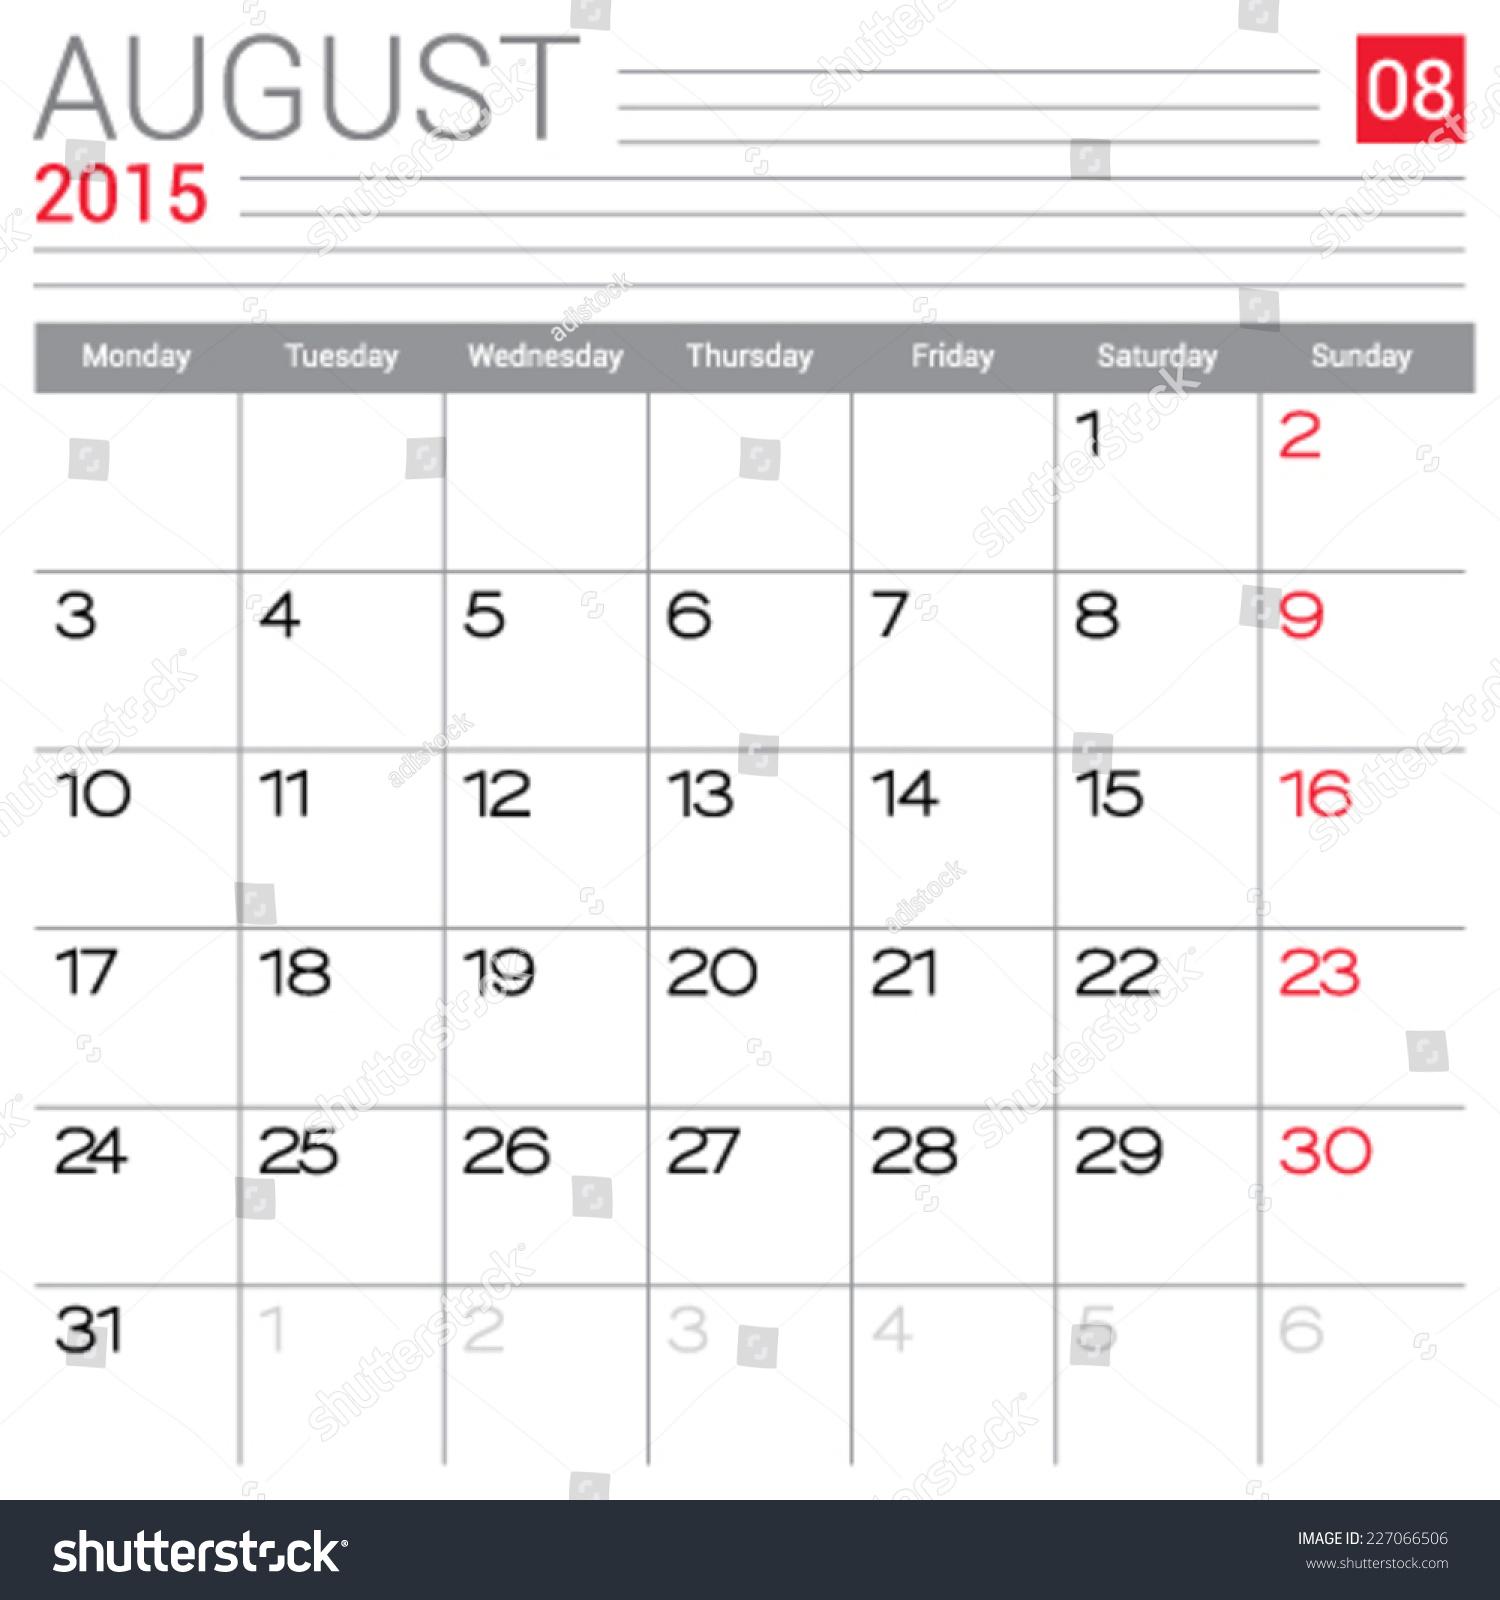 Calendar august 2015 template 147 best calendar images on pinterest 2016 calendar printable publicscrutiny Image collections